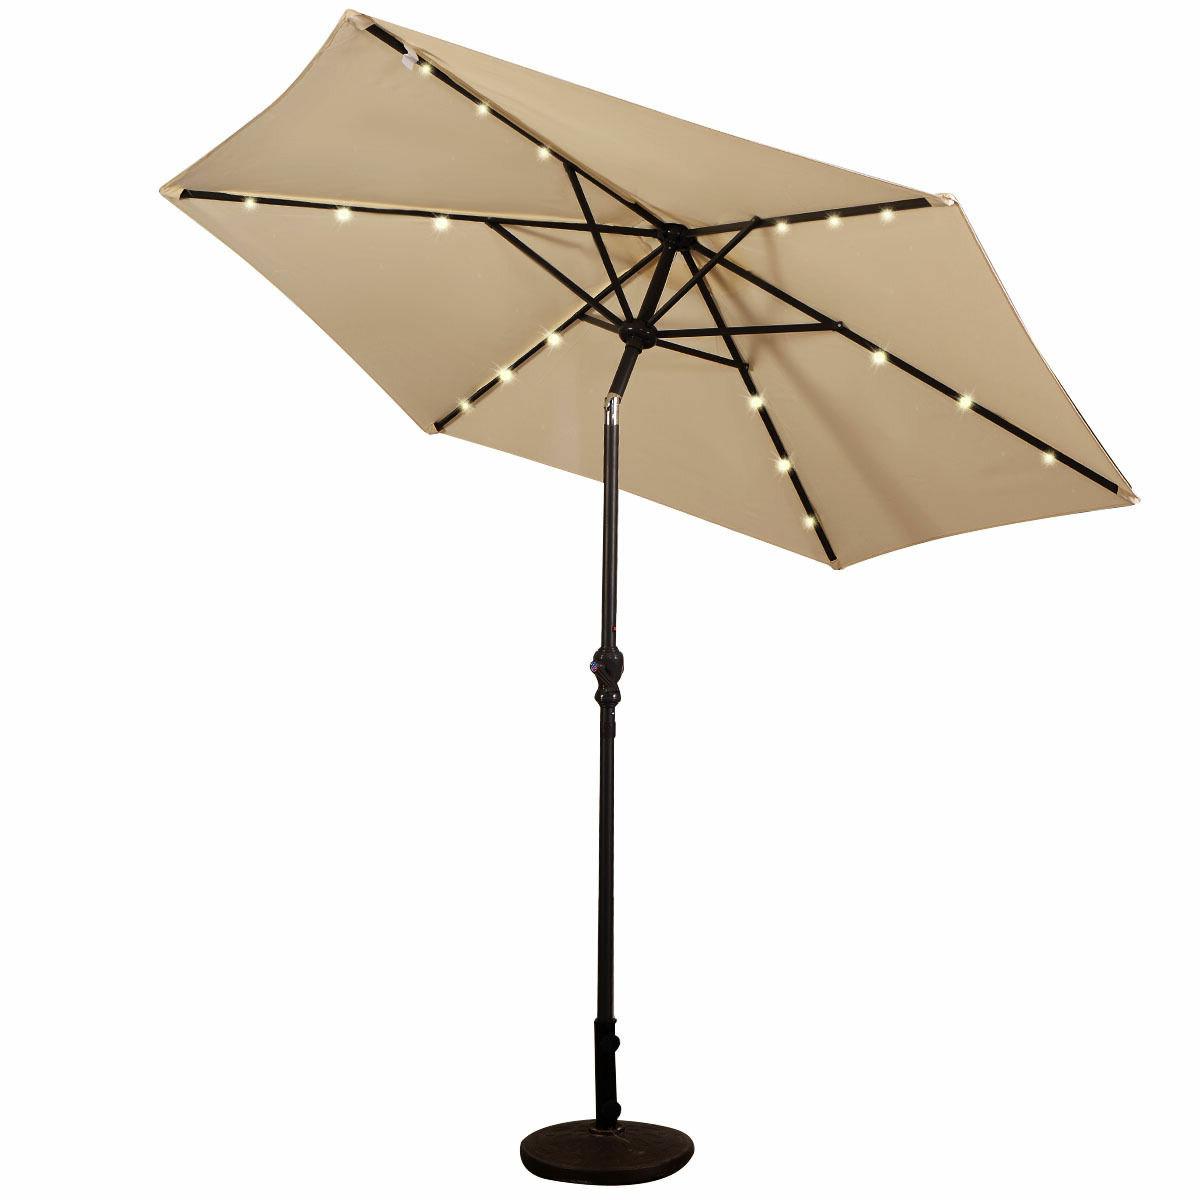 Freeport Park Eastwood 9' Market Umbrella In Best And Newest Eastwood Market Umbrellas (View 4 of 20)